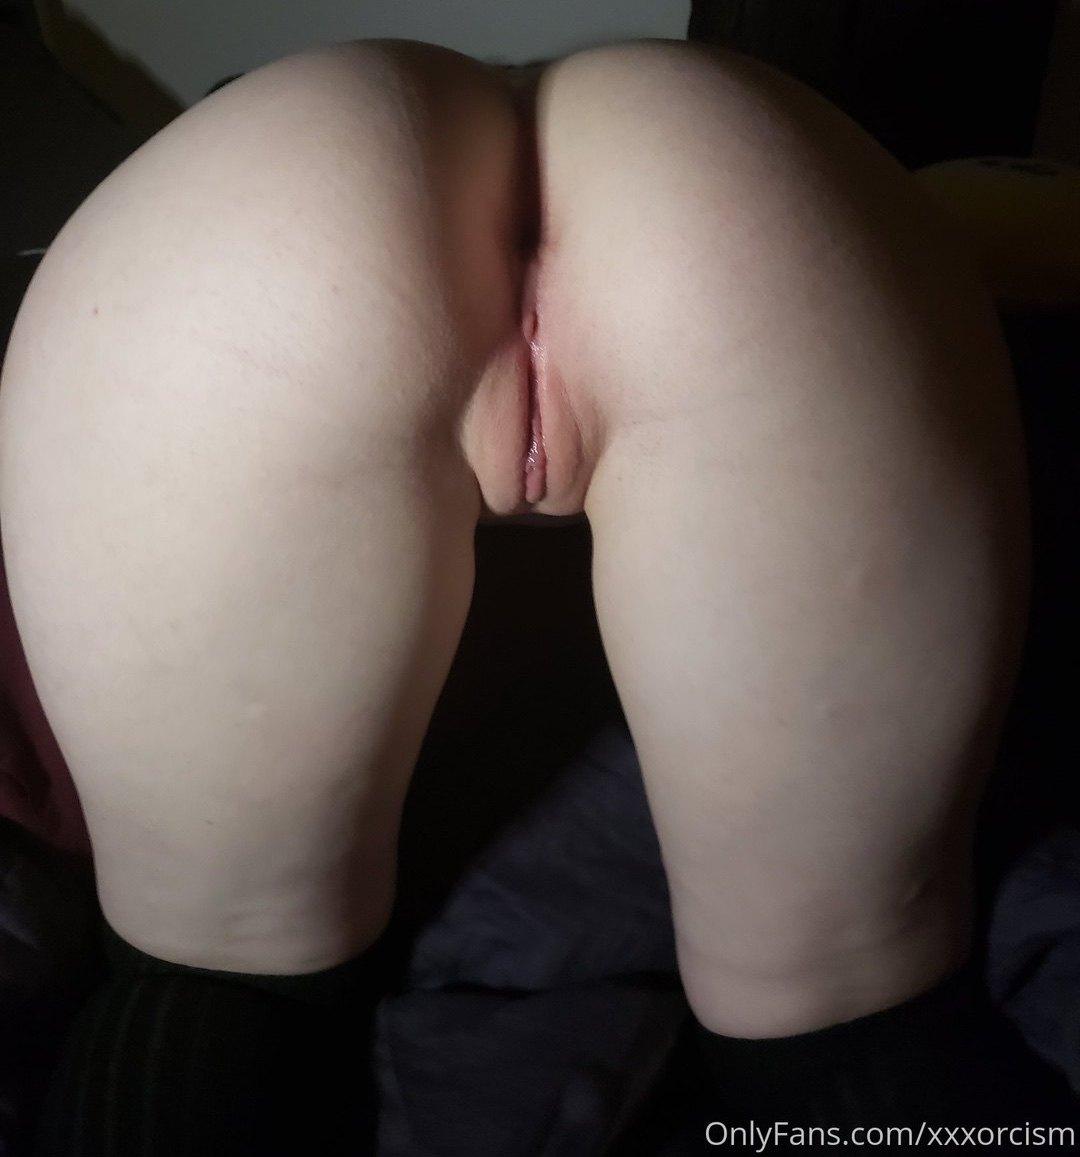 Stacia Grey Xxxorcism Onlyfans Nudes Leaks 0008